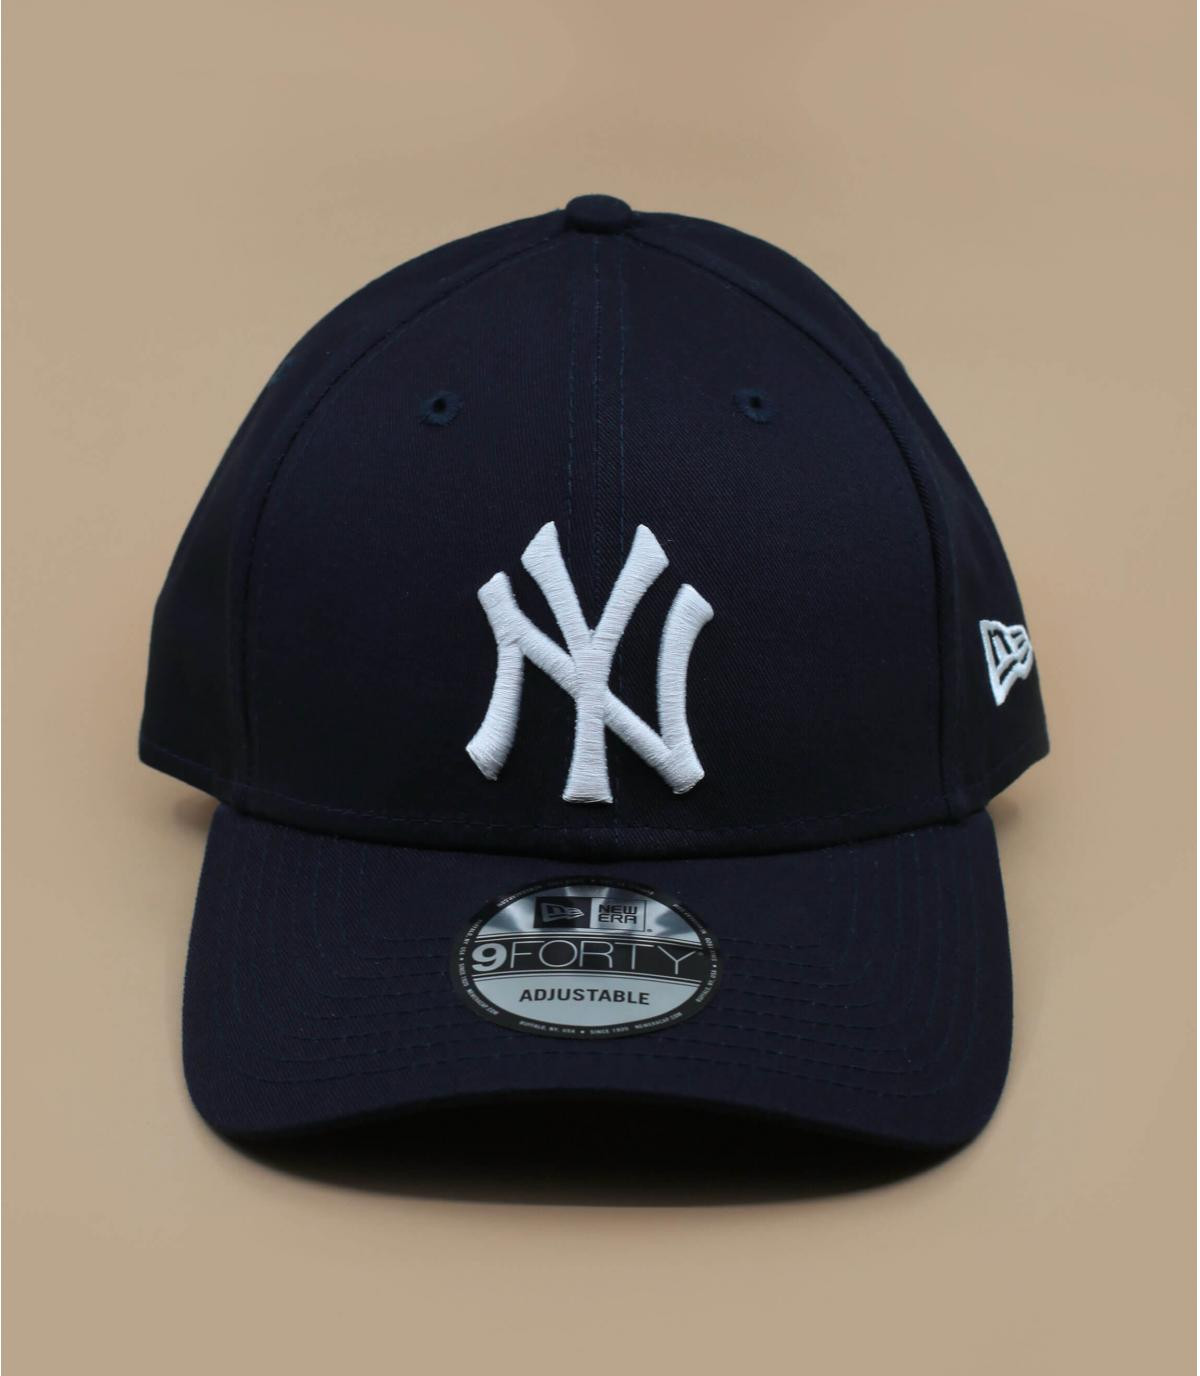 Dettagli League Ess NY 9Forty navy white - image 2